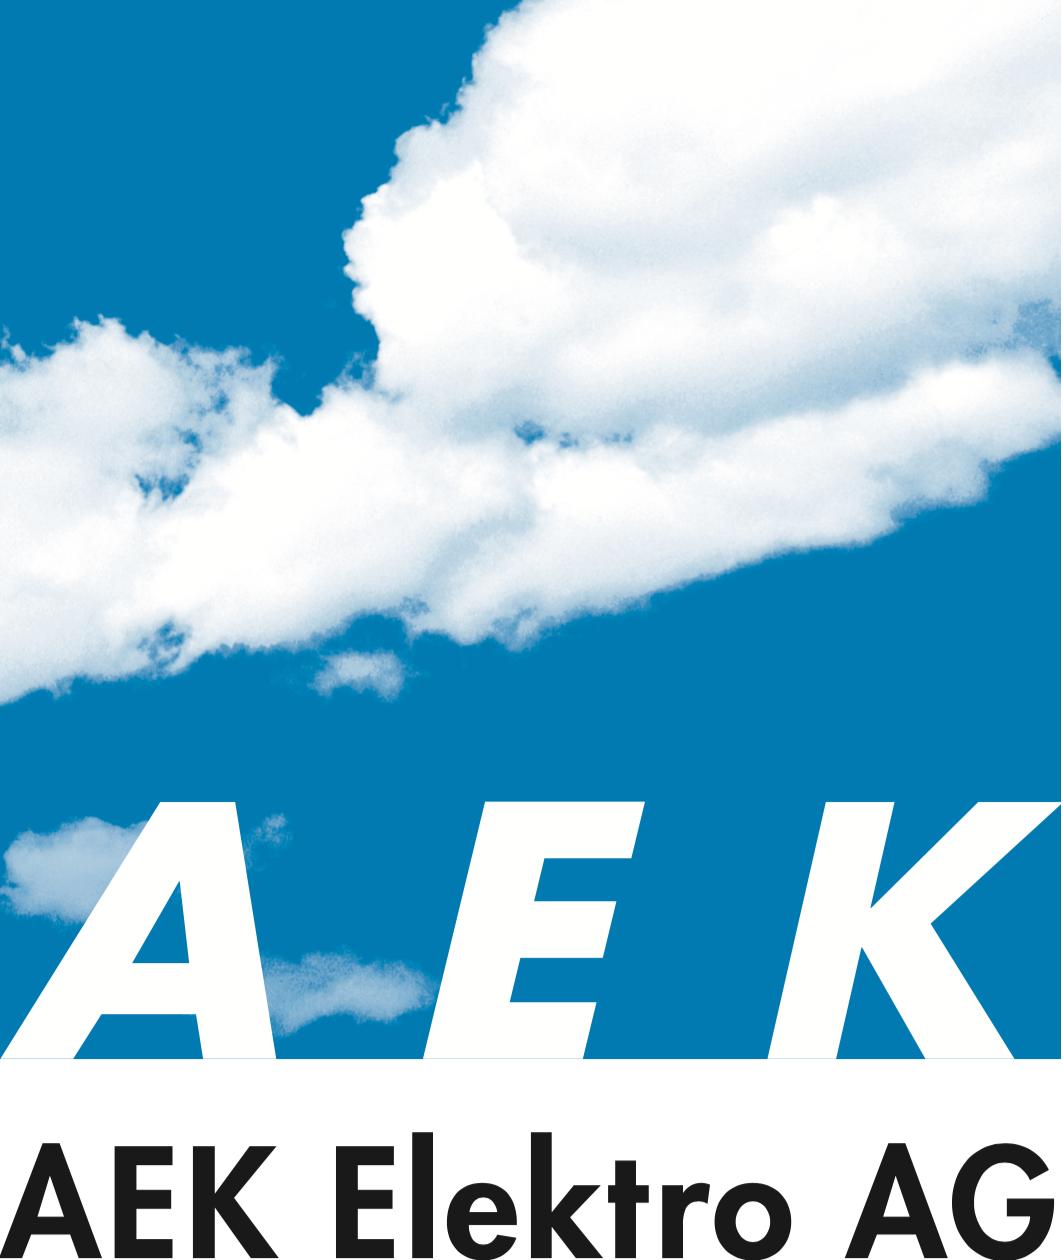 AEK Elektro AG.png